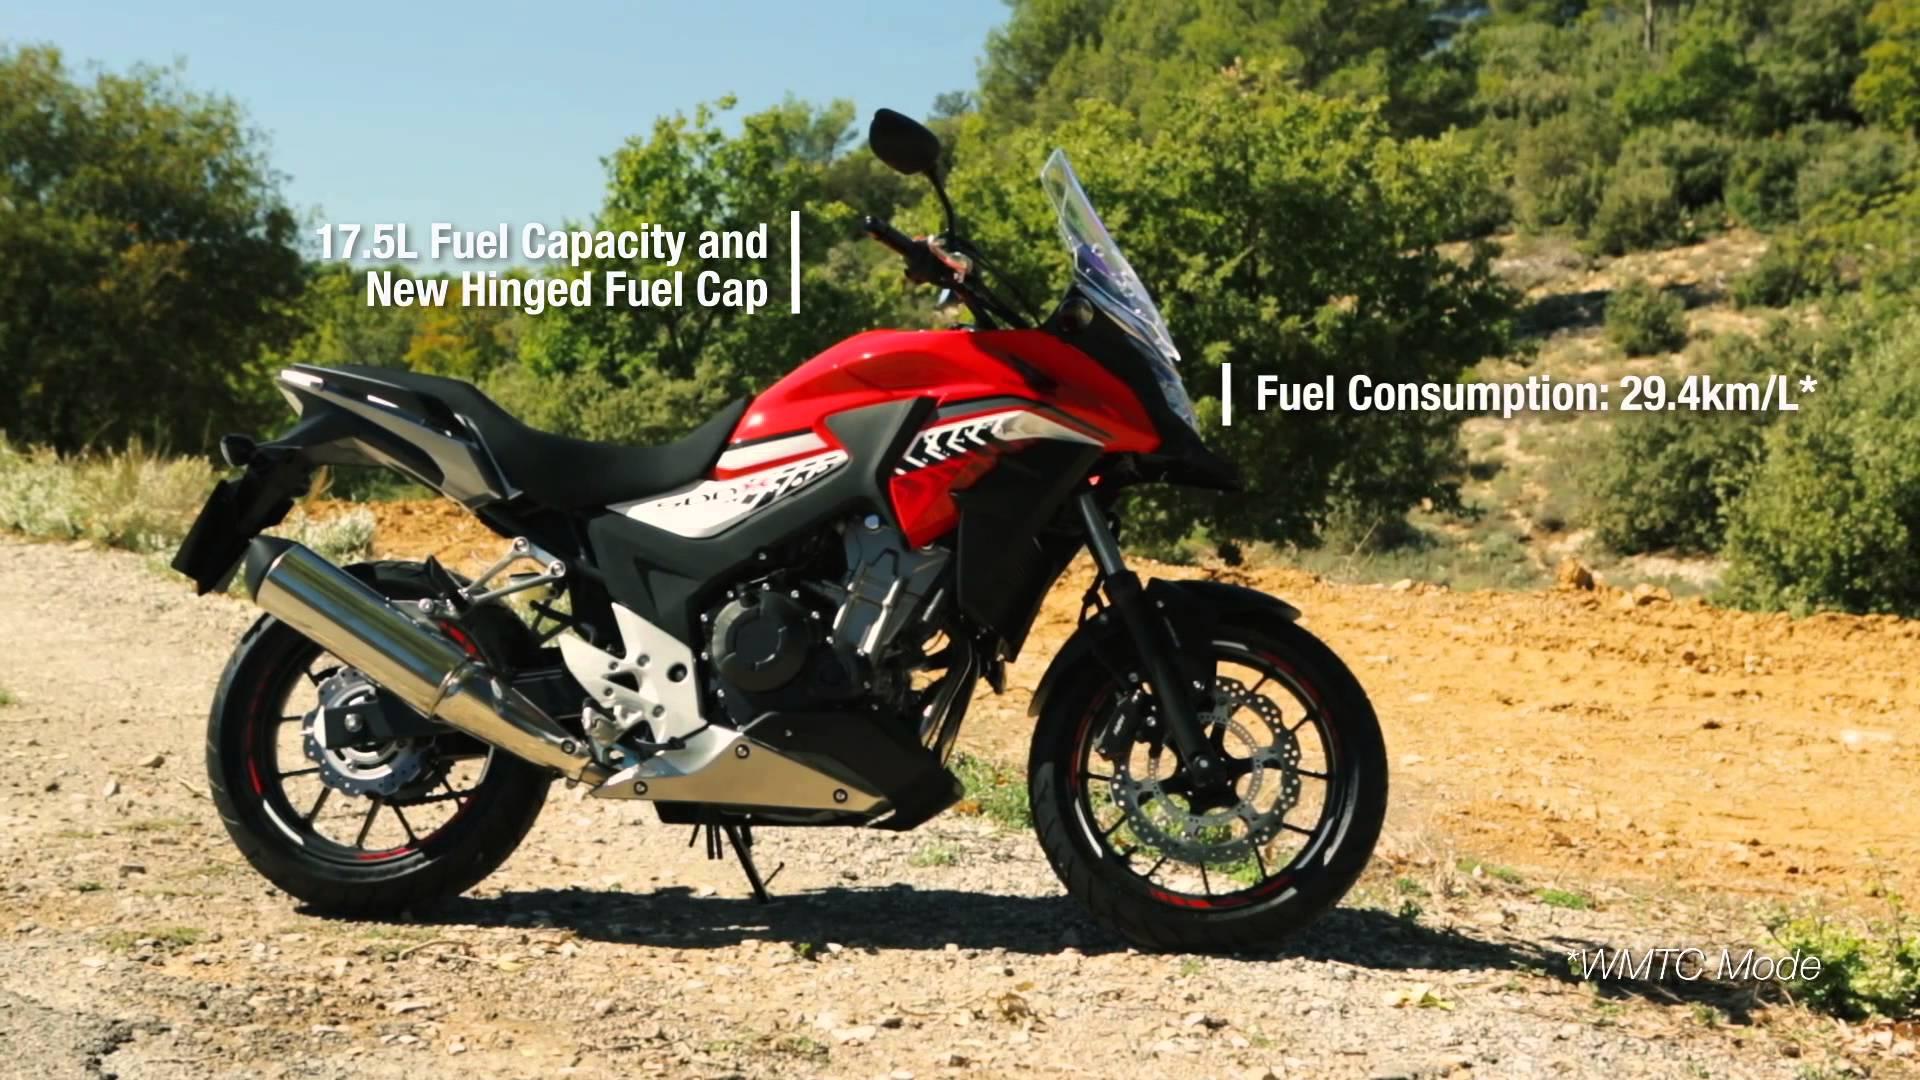 2016 Honda CB500X Motorcycle